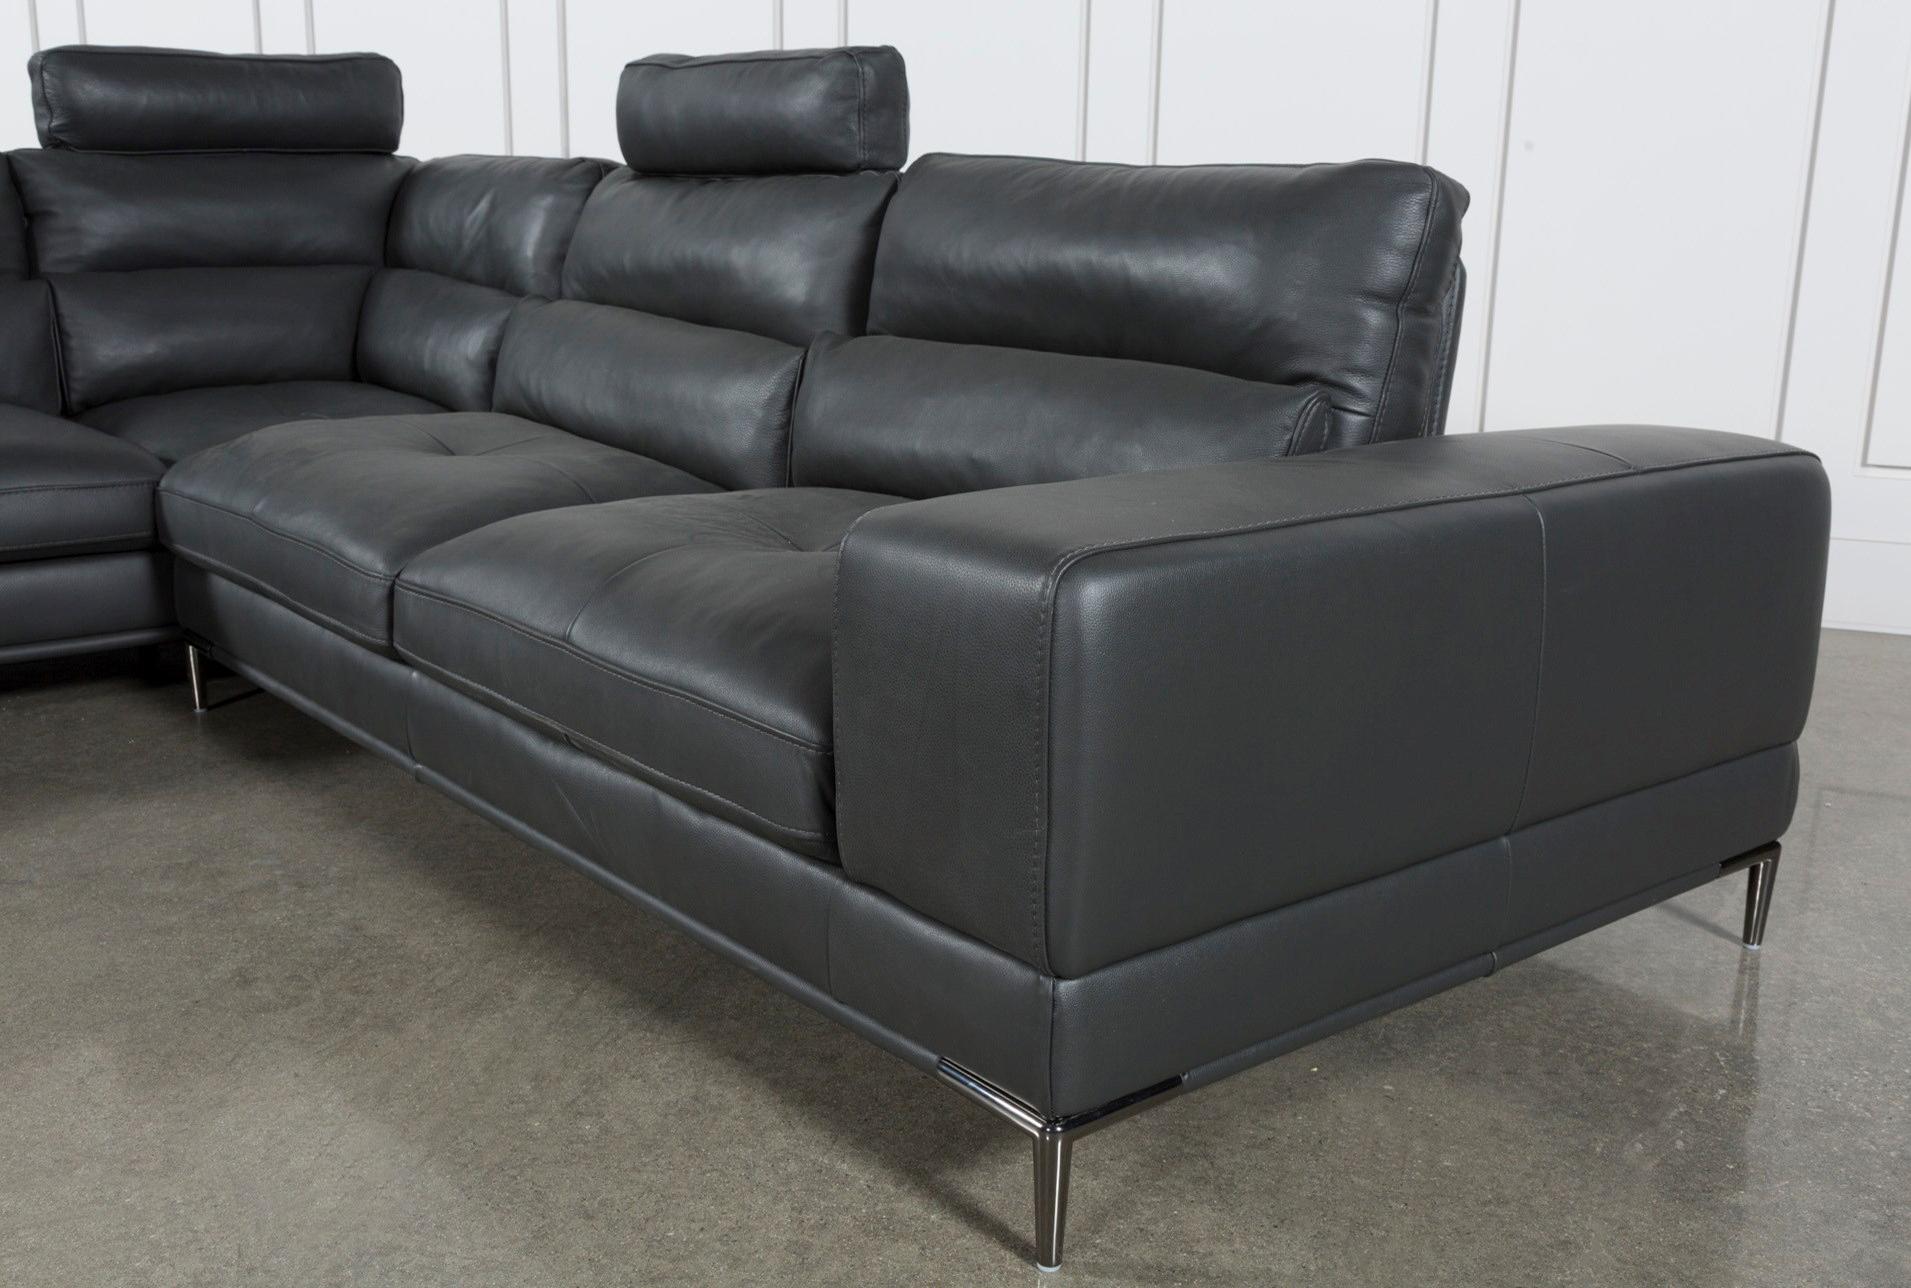 Latest Tenny Dark Grey 2 Piece Right Facing Chaise Sectional W/2 Headrest For Tenny Dark Grey 2 Piece Left Facing Chaise Sectionals With 2 Headrest (View 2 of 20)